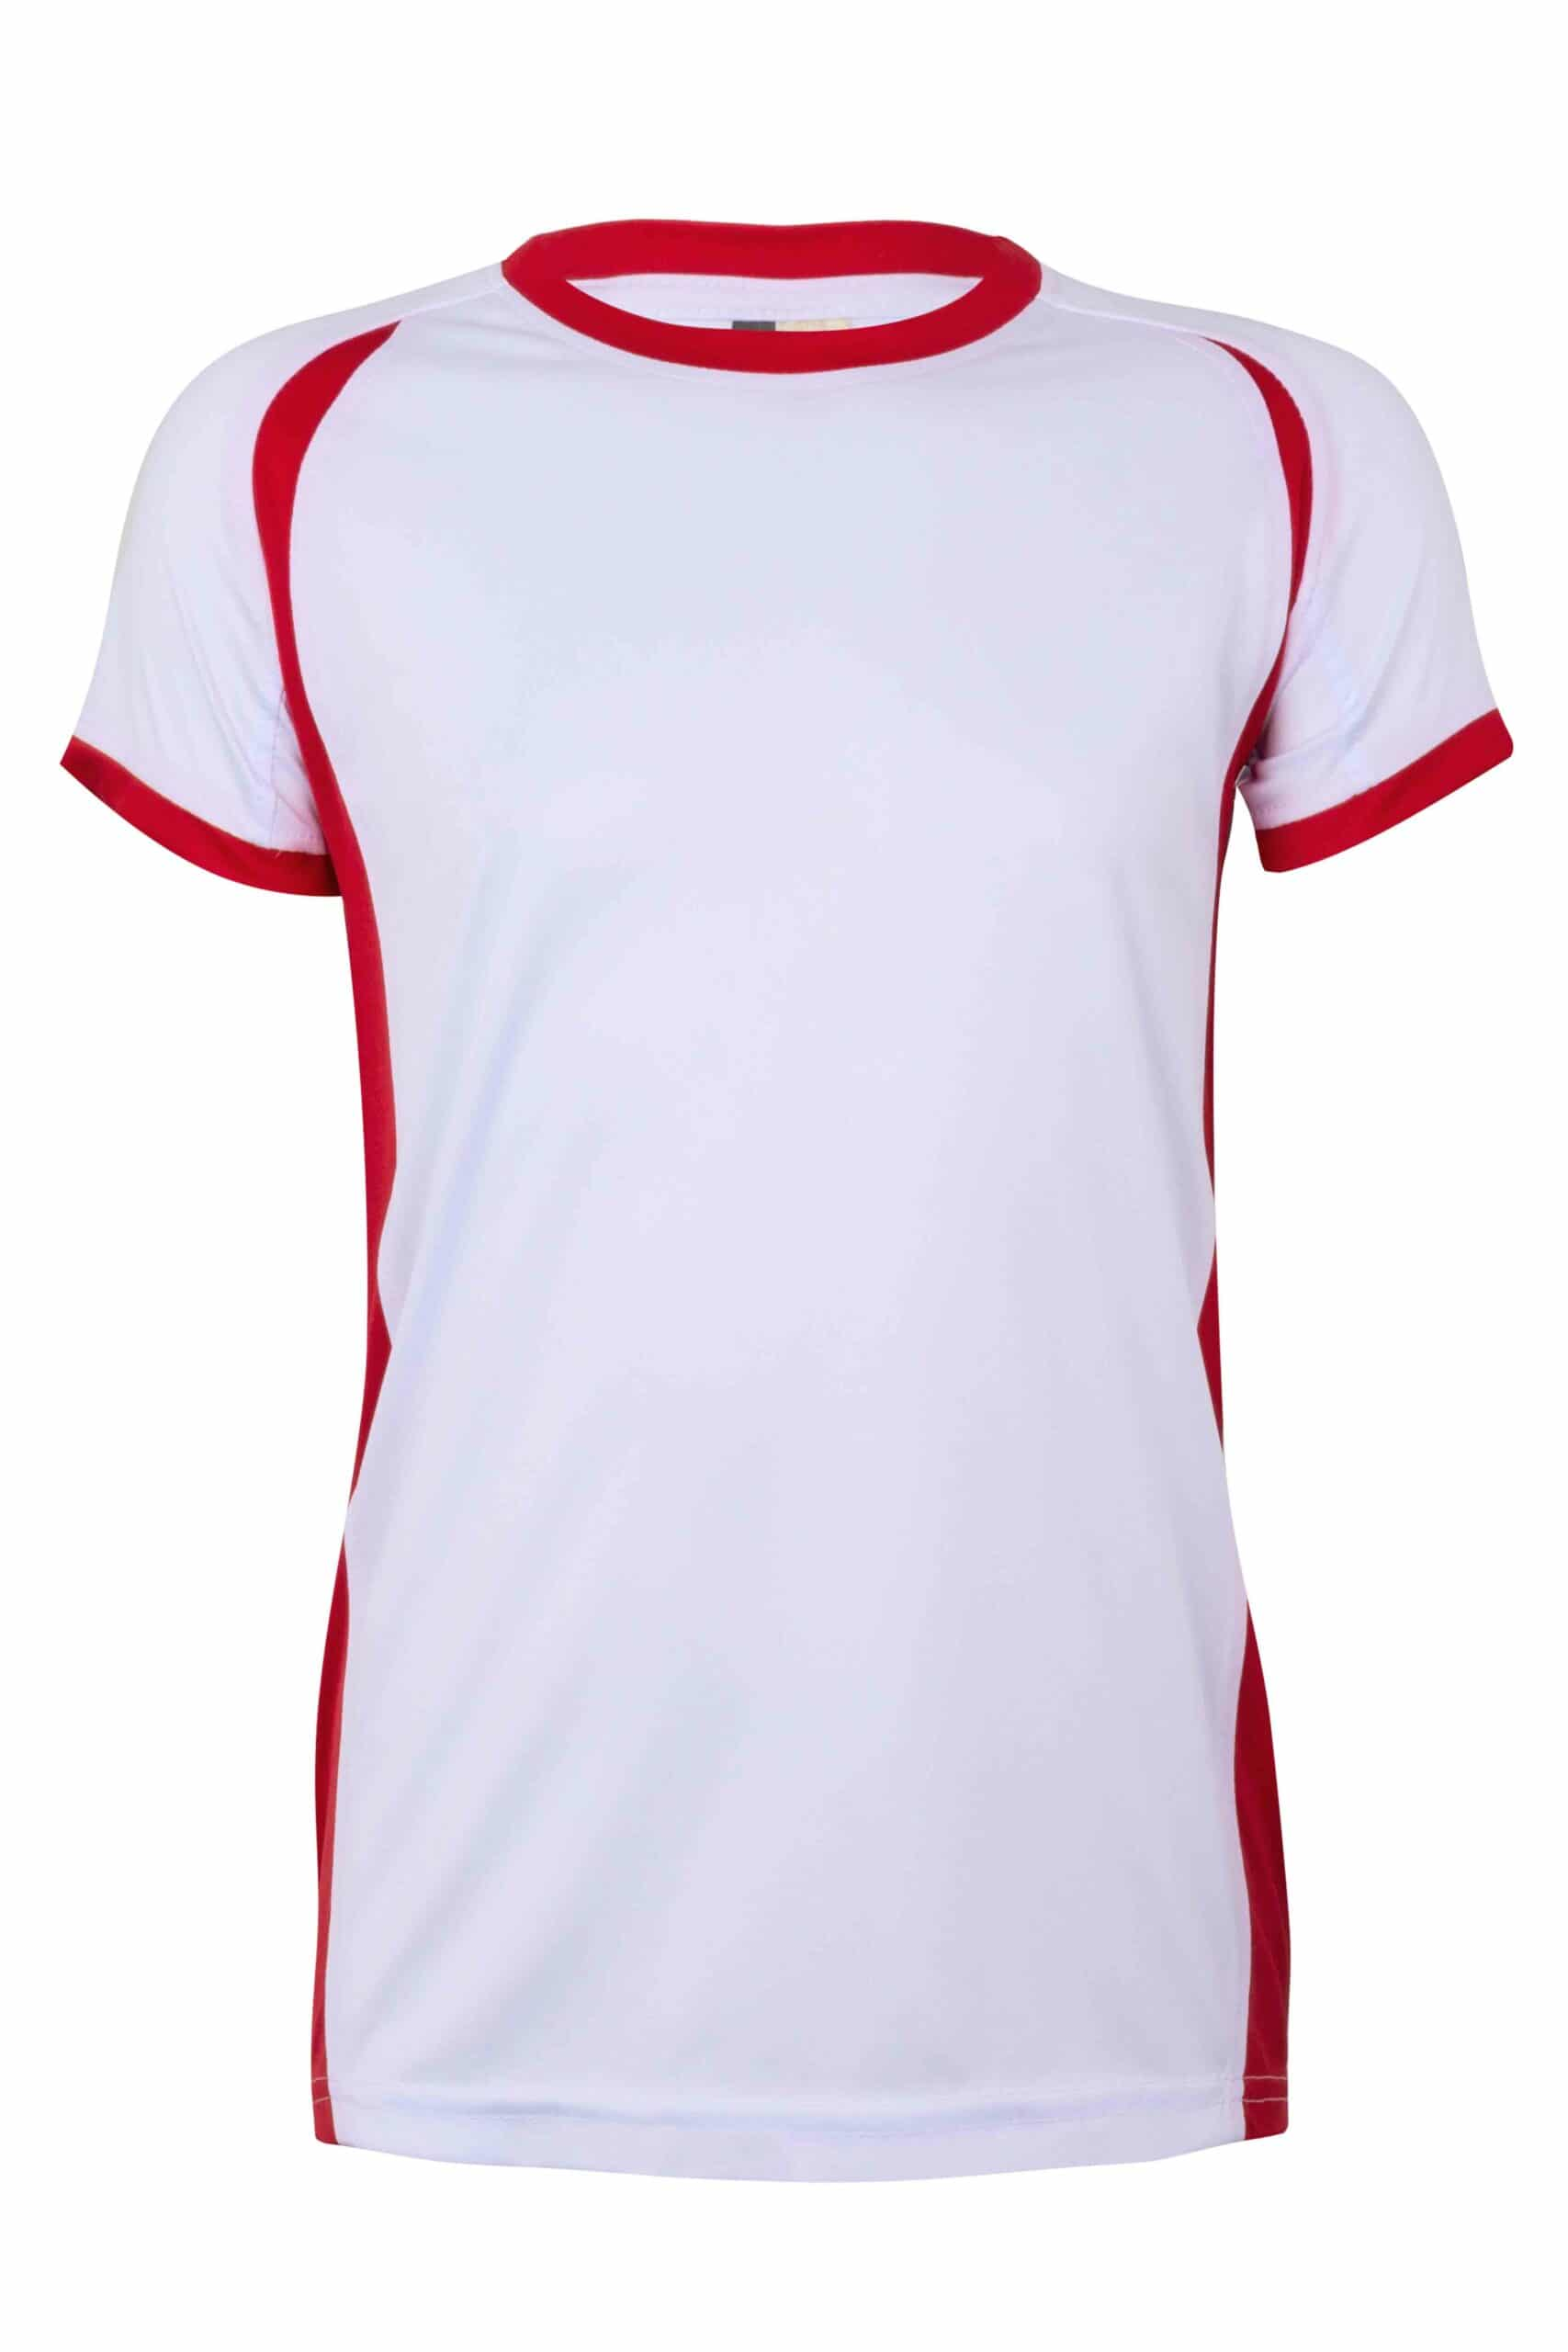 Mukua Mk531v Camiseta TÉcnica Manga Corta Bicolor NiÑo White Red 1